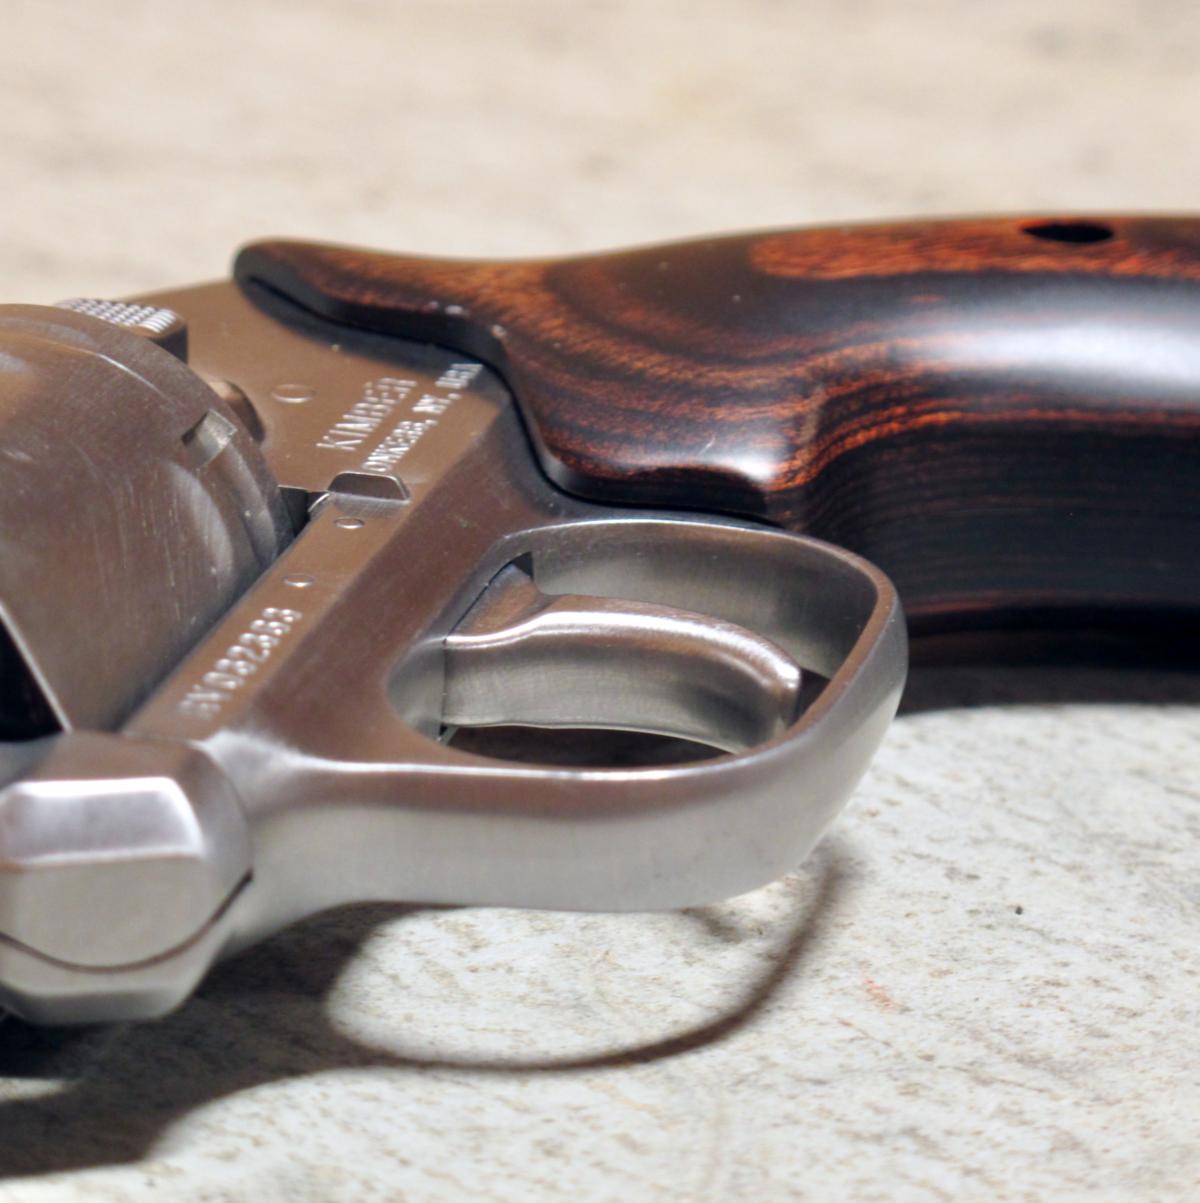 Grant Cunningham on Revolver Trigger Reset